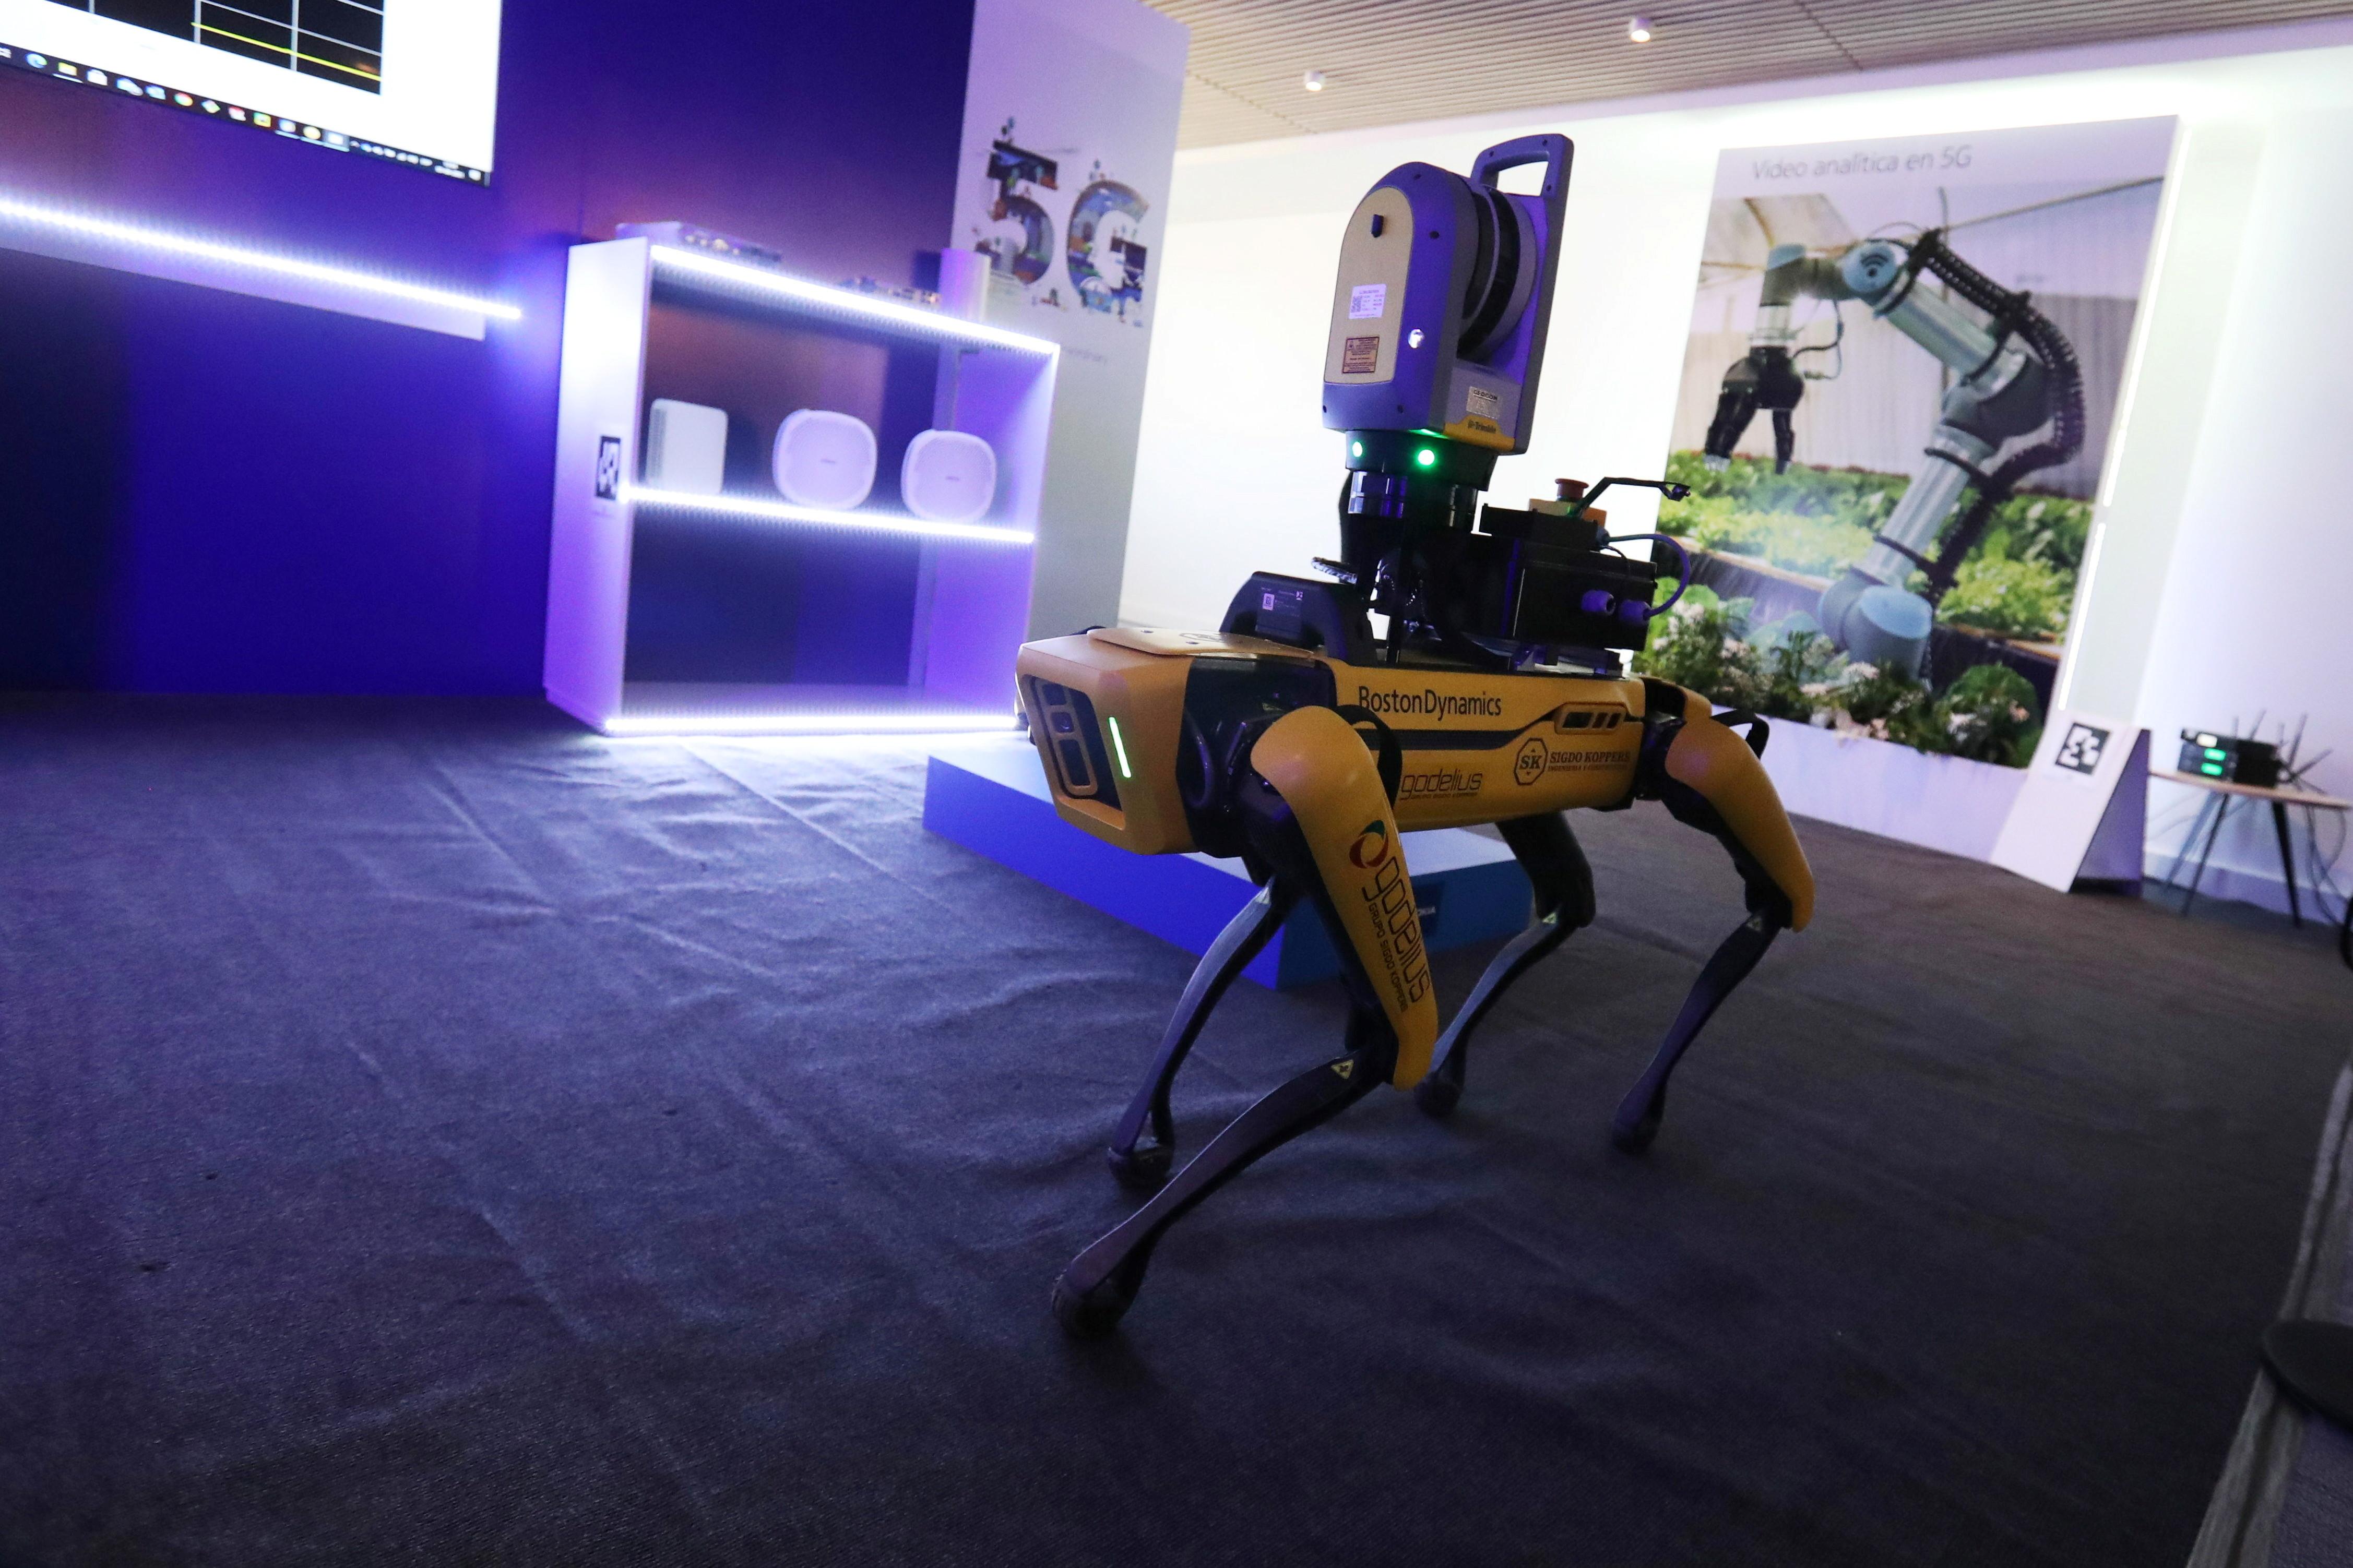 the Boston Dynamics' four-legged robot Spot is shown.